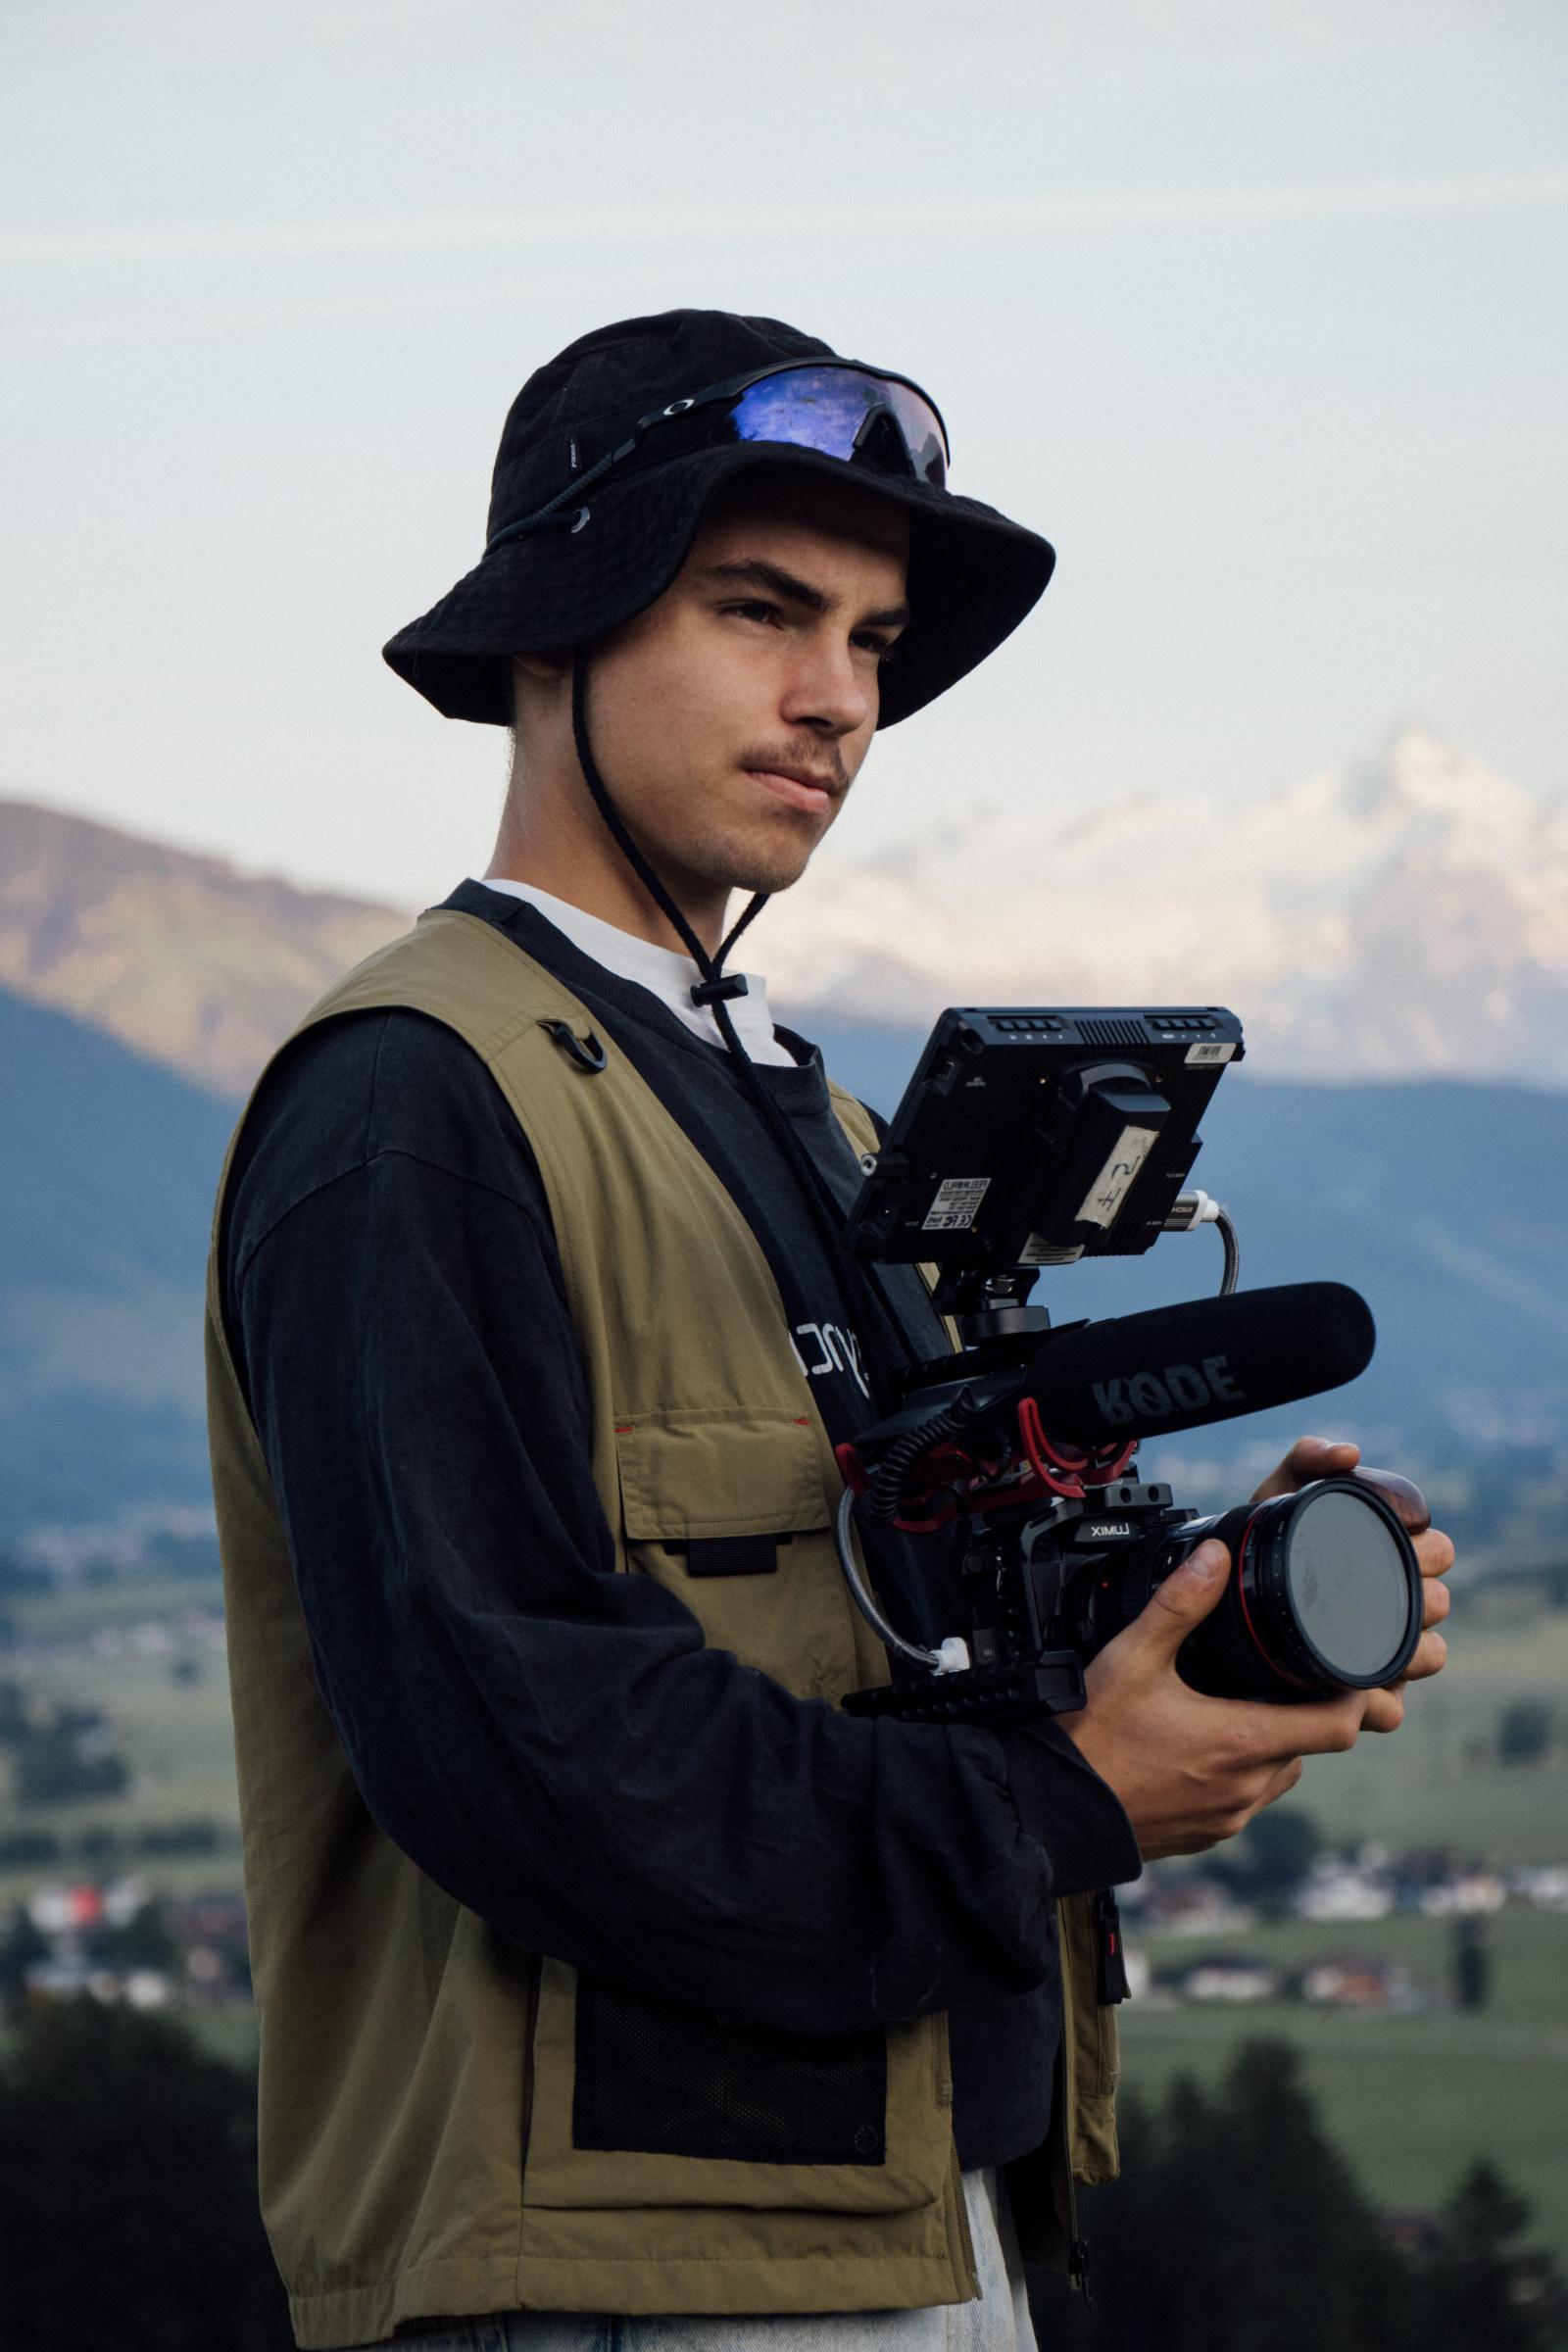 david with gh5 camera